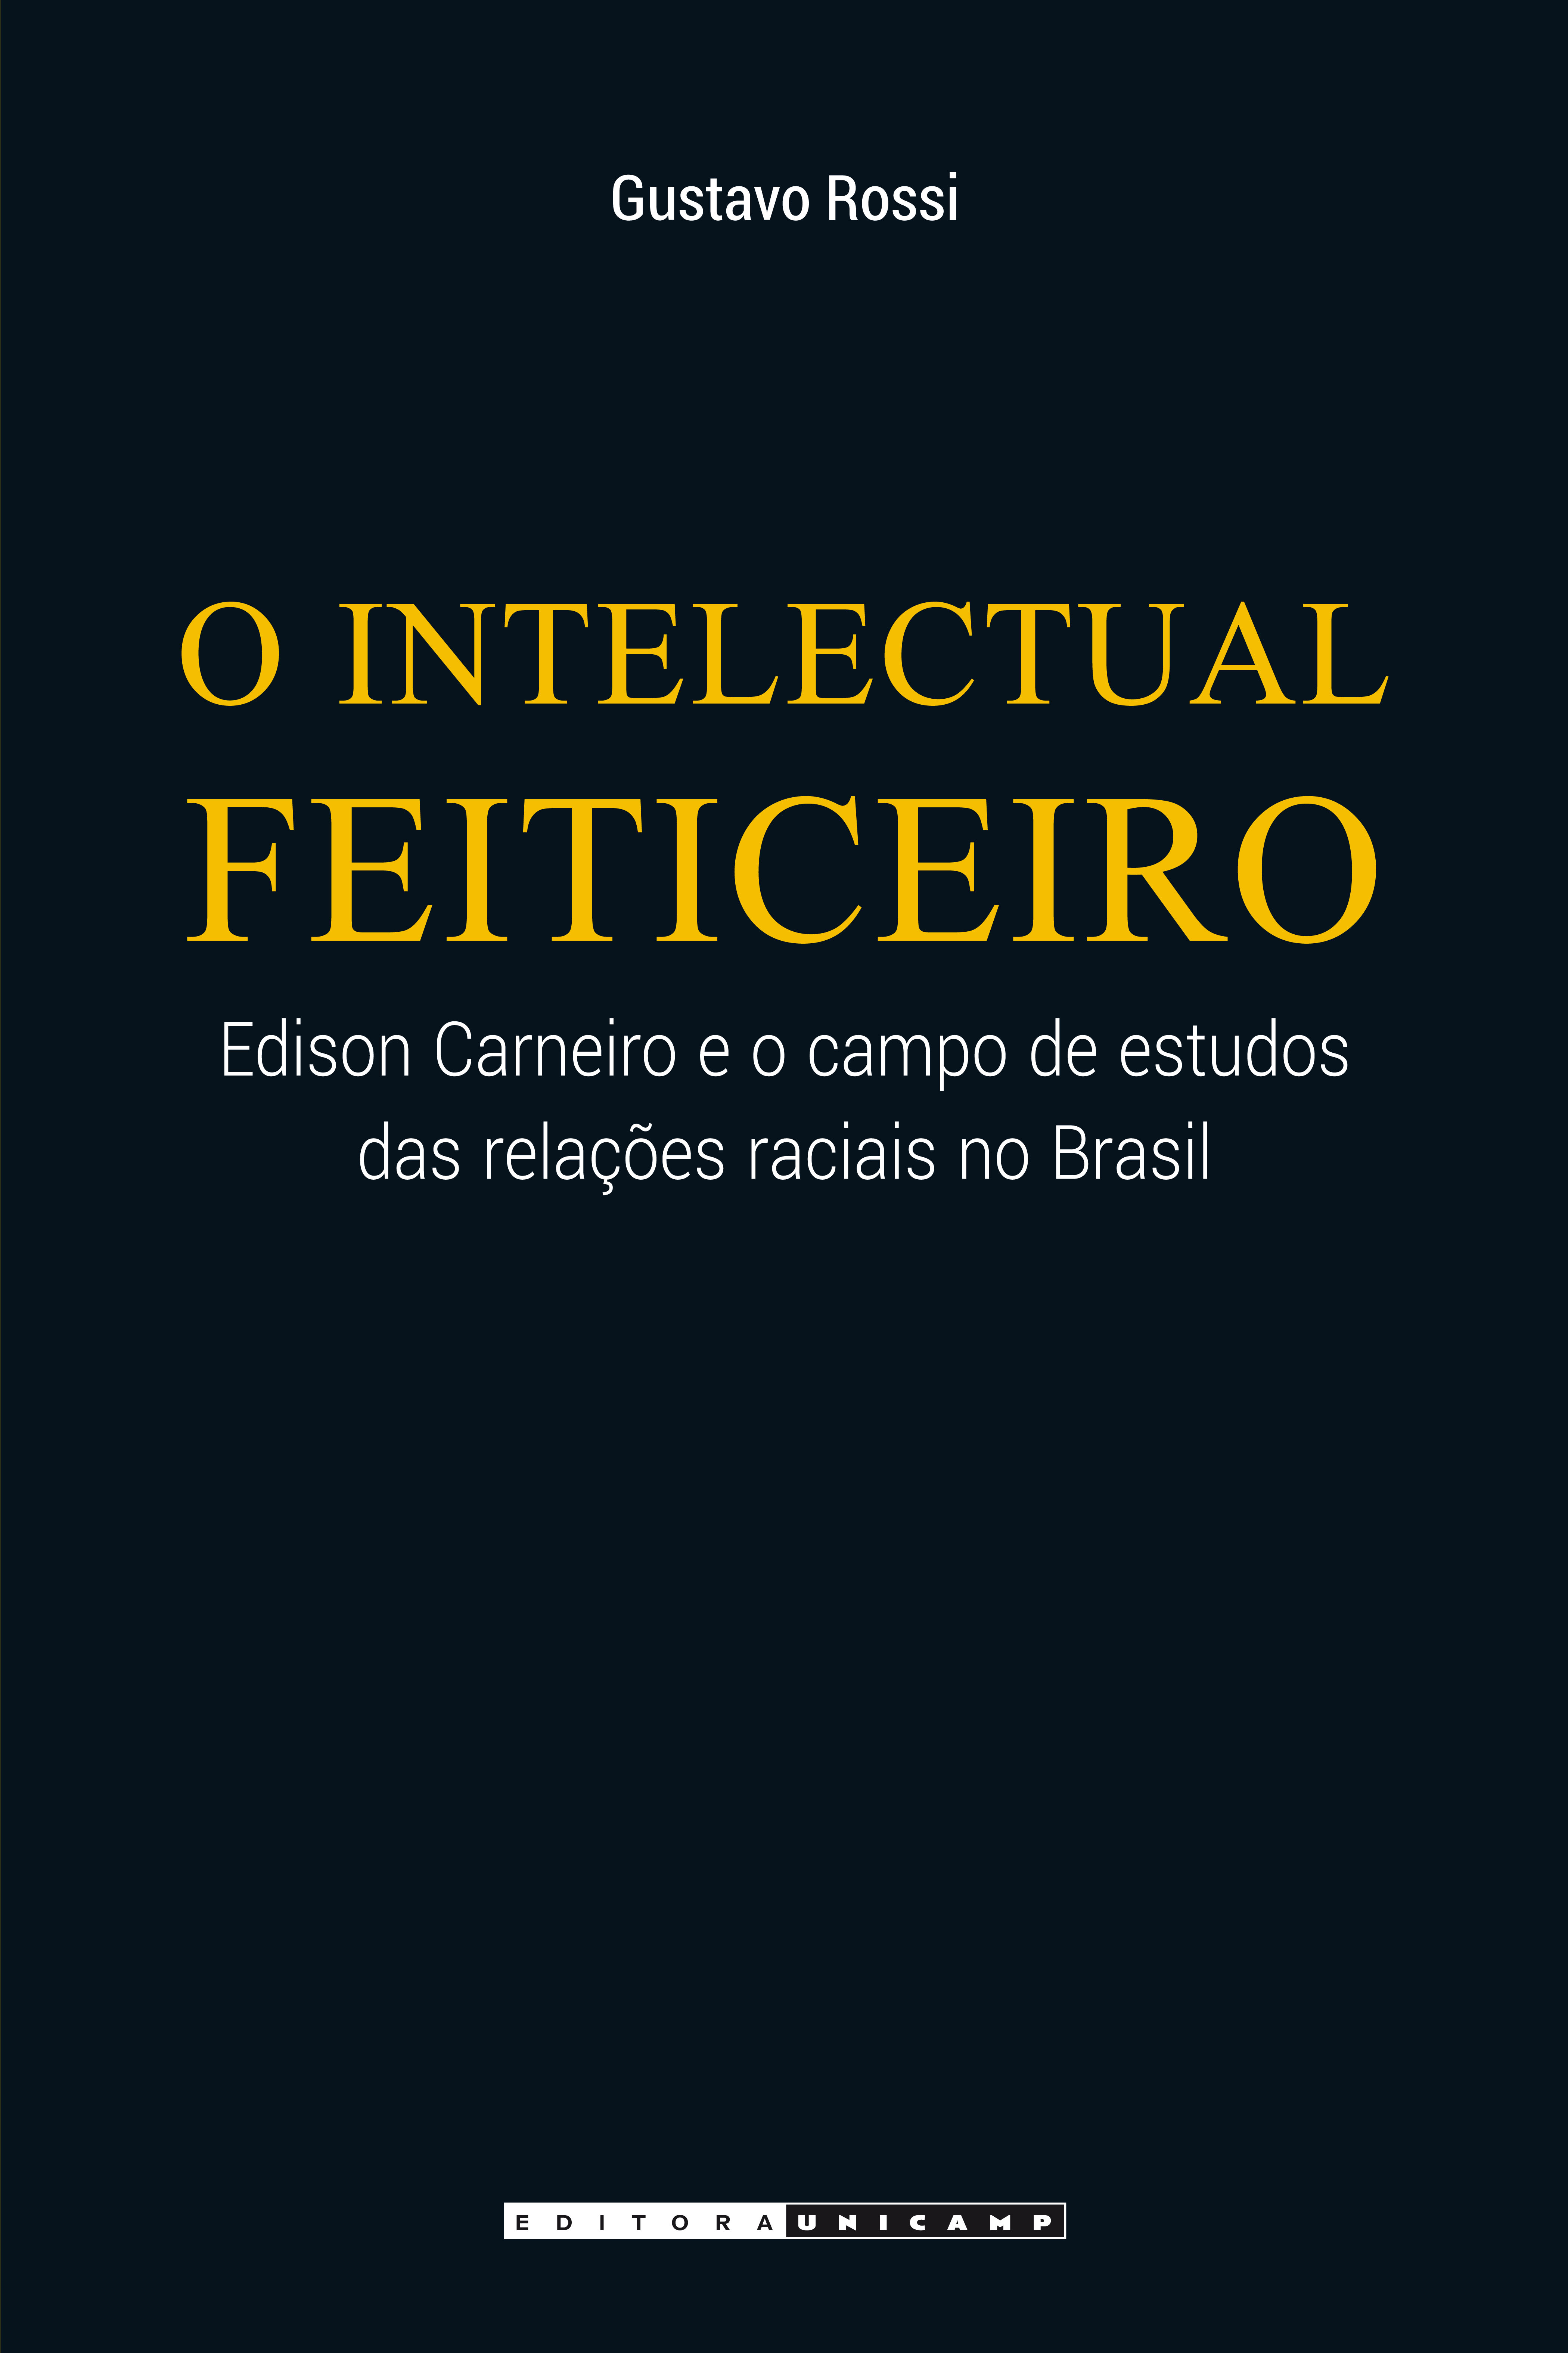 O intelectual Feiticeiro - Edison Carneiro e o campo de estudos das relações raciais no Brasil